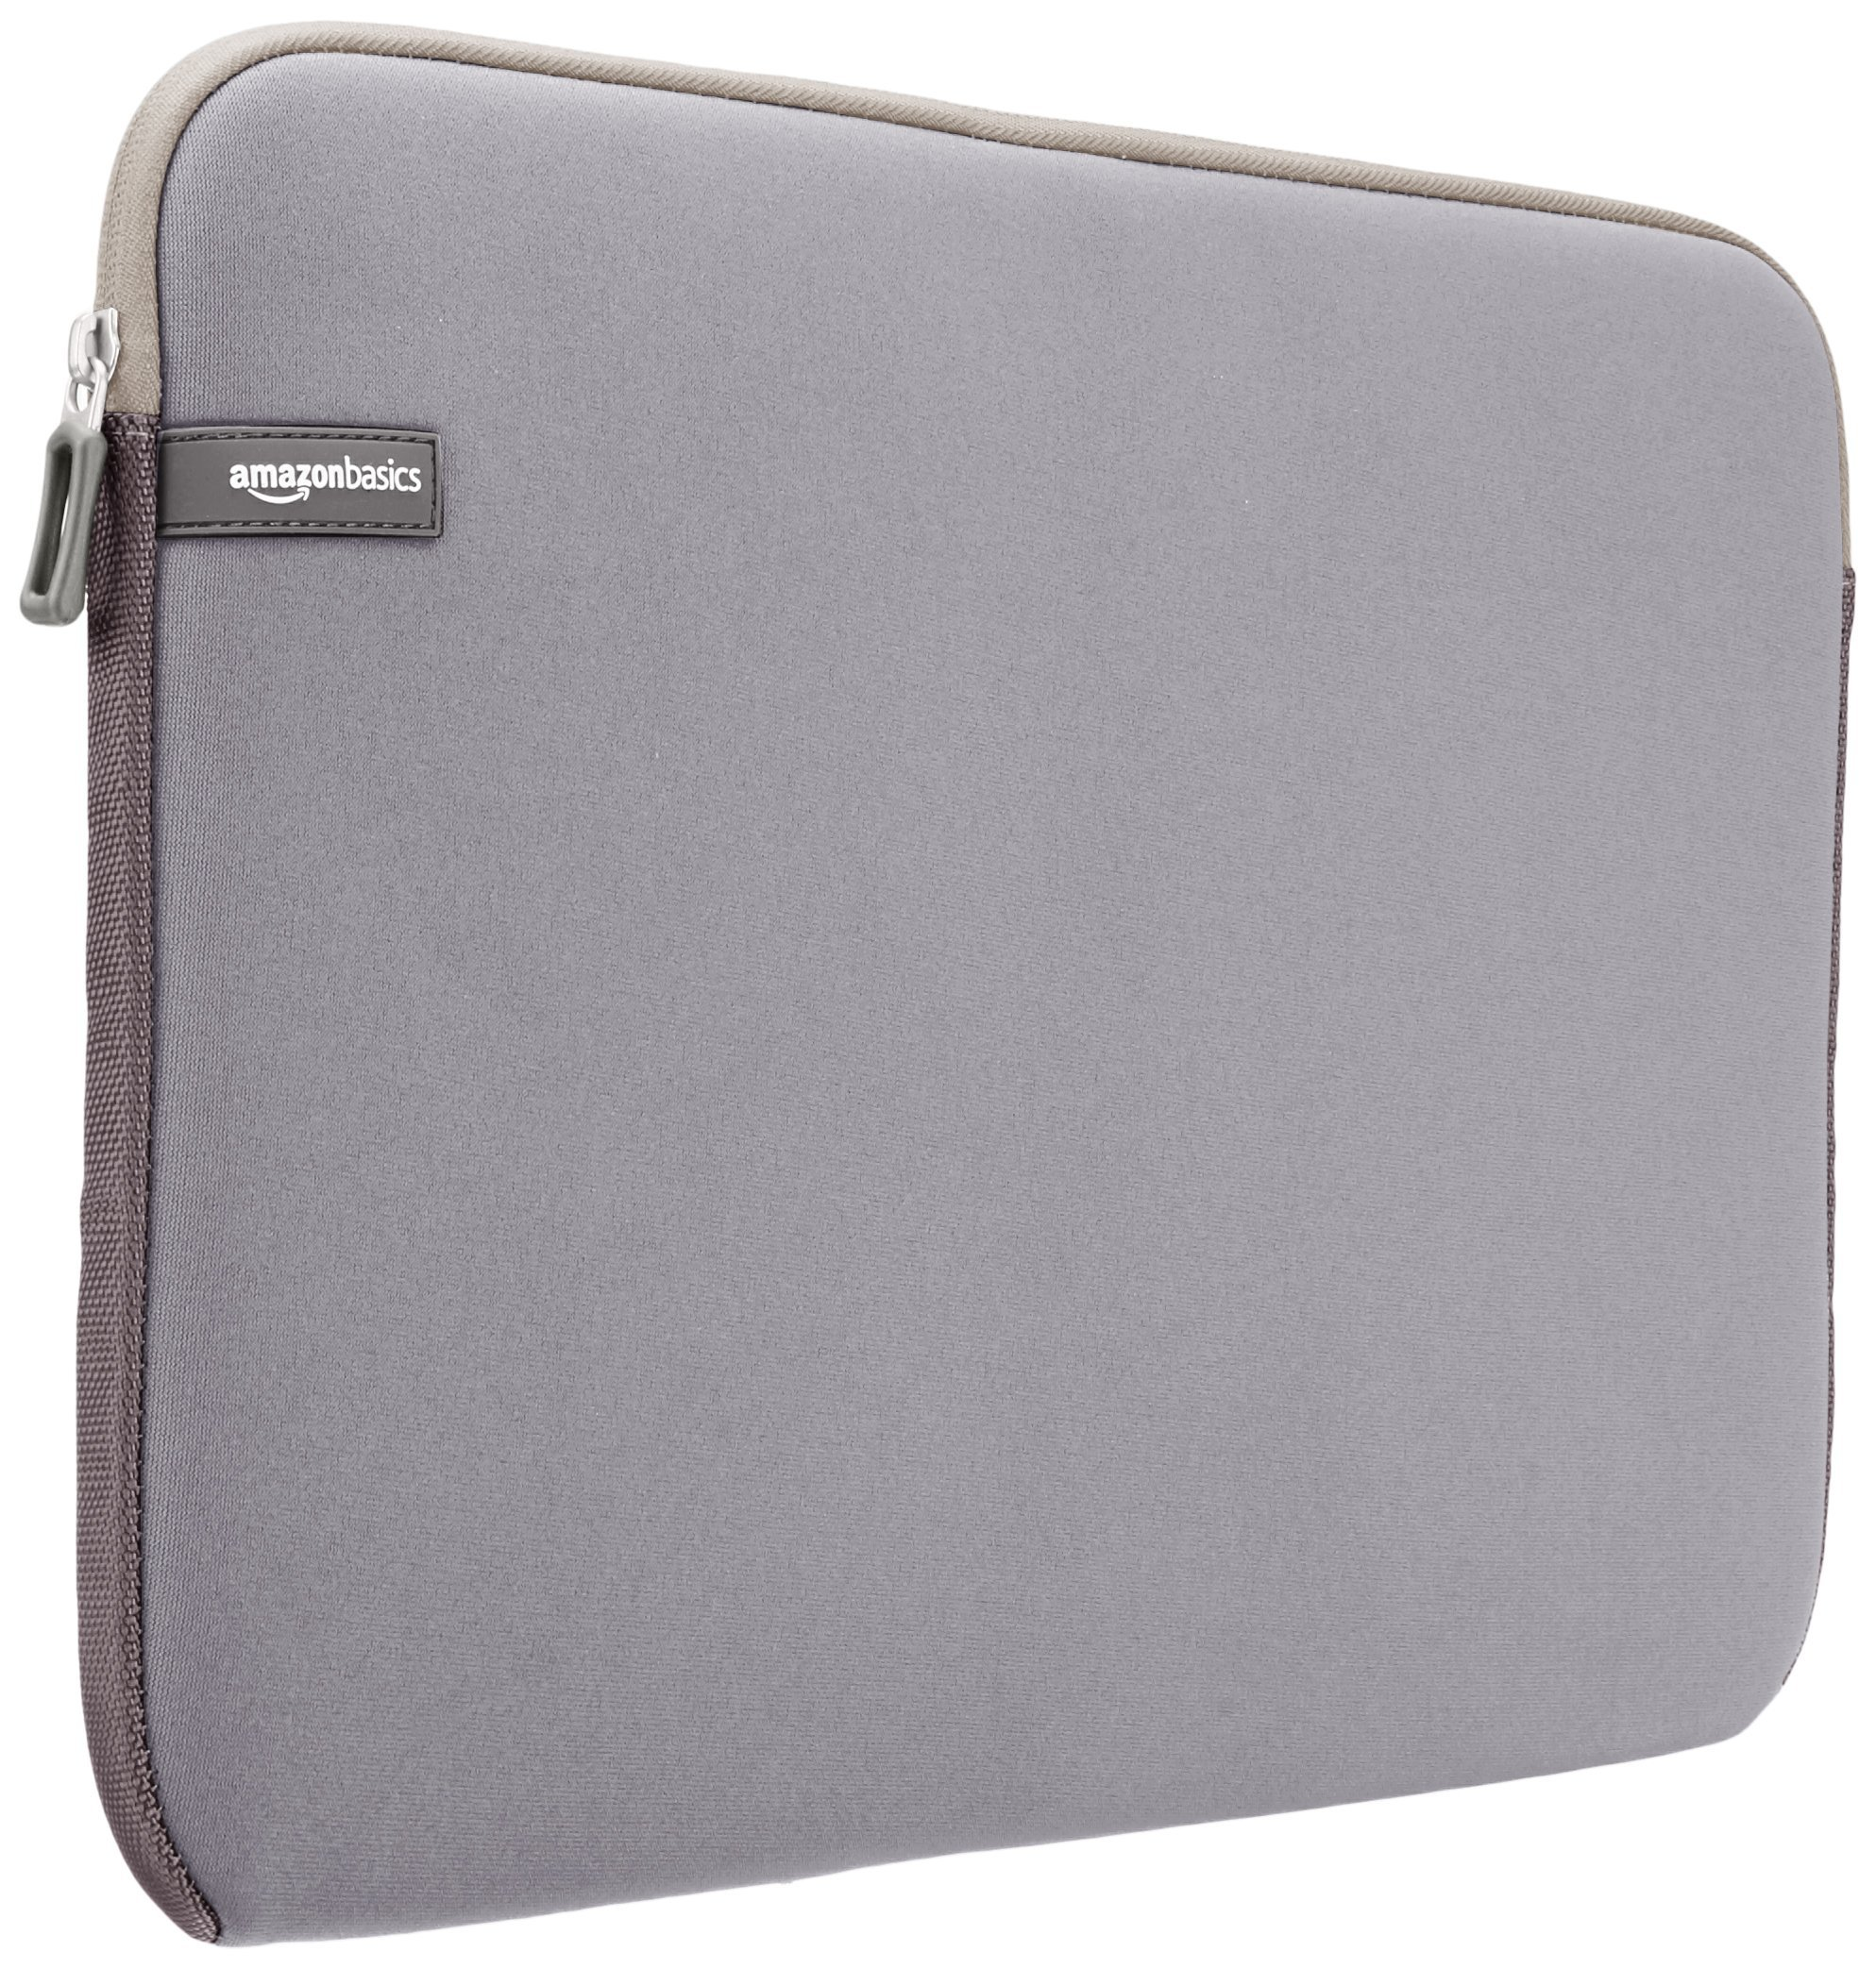 AmazonBasics 15.6 Inch Laptop Computer Sleeve Case - Grey 1-